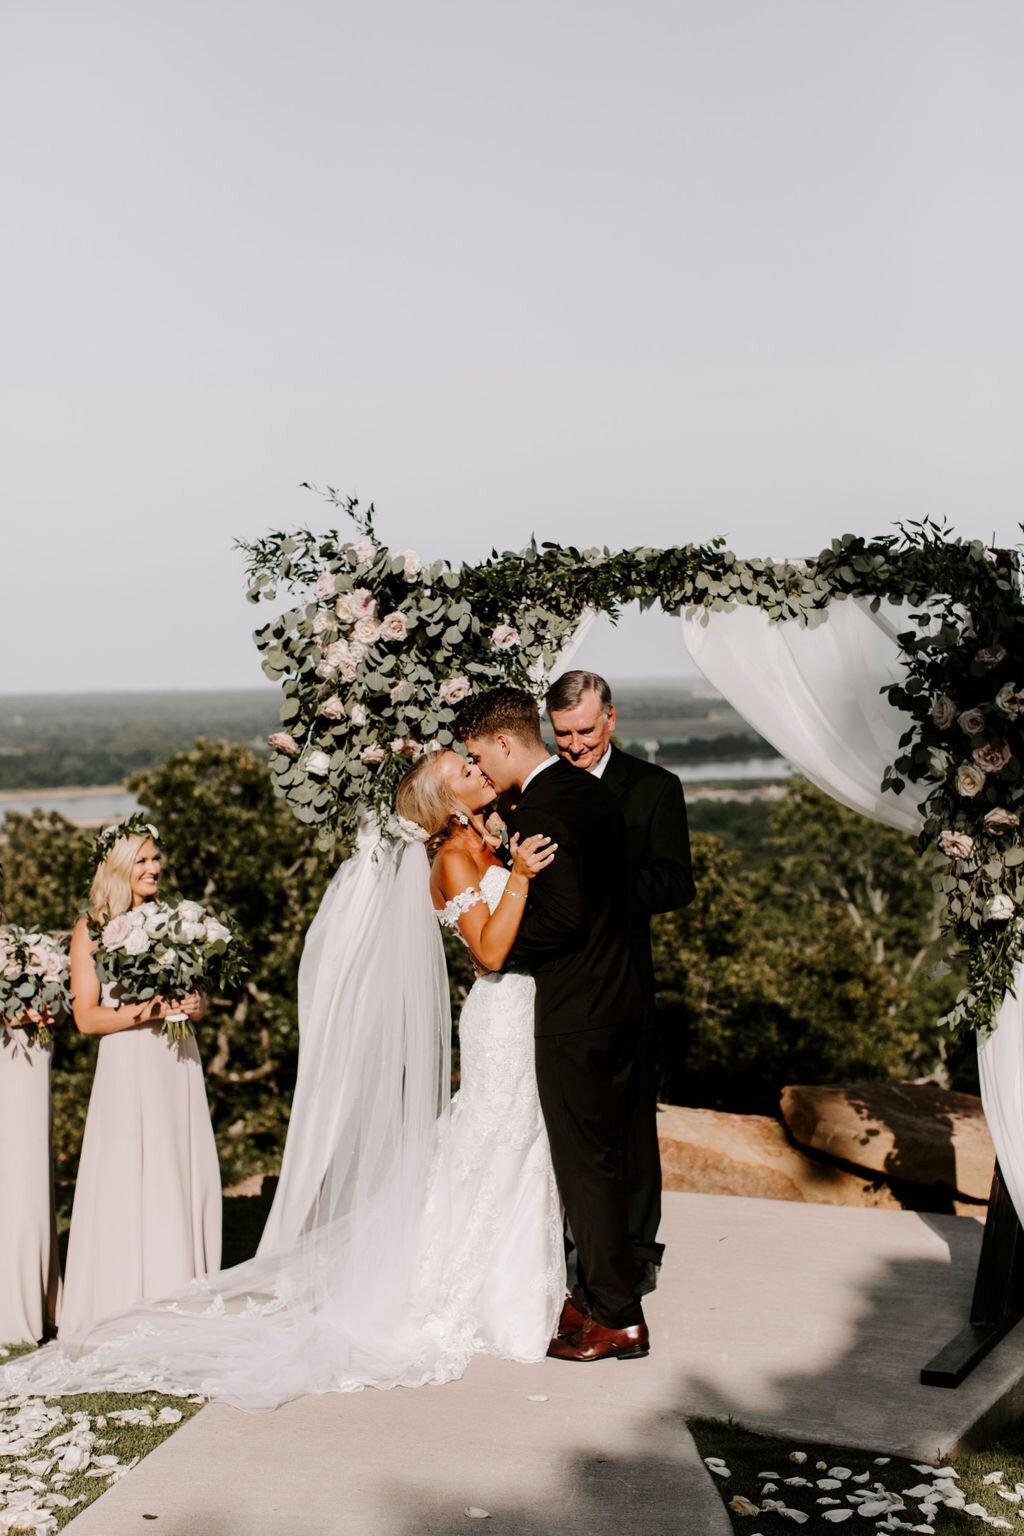 Tulsa White Barn Wedding Venue Outdoor Ceremony 93.jpg